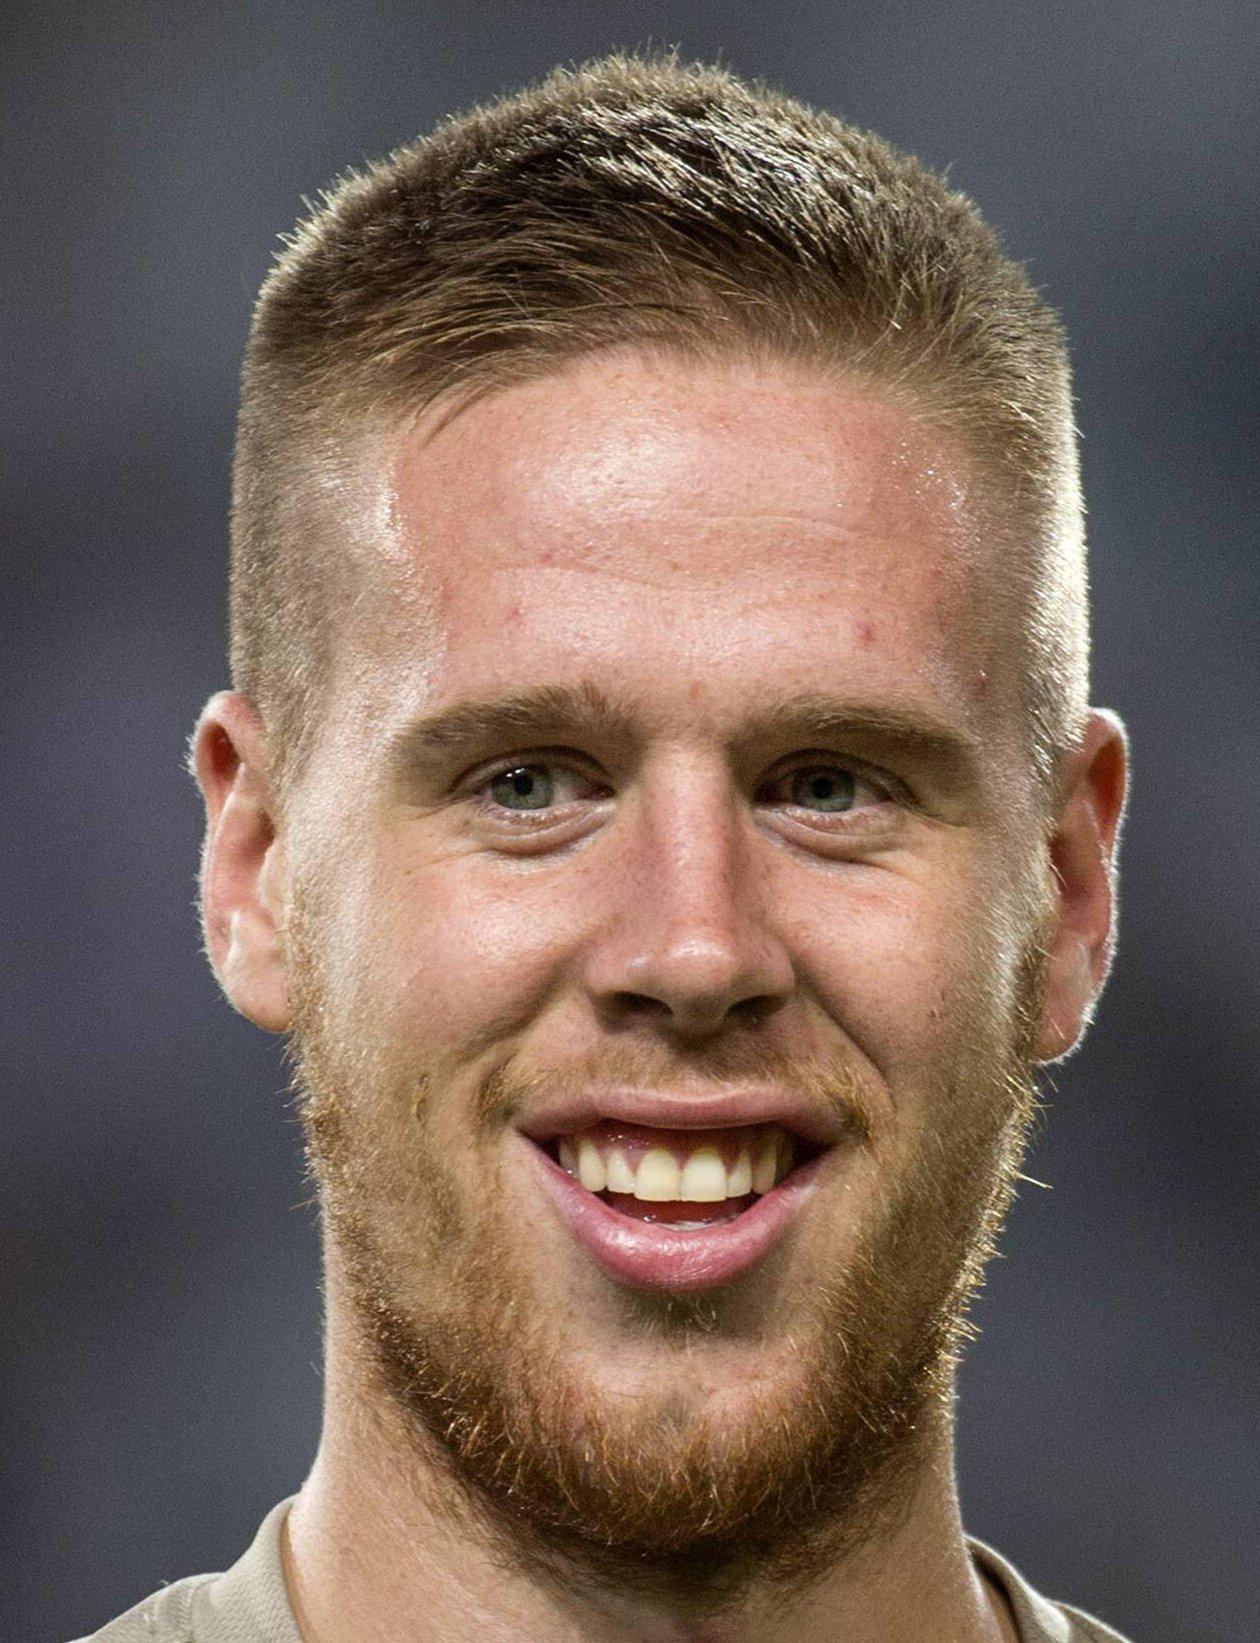 Pontus Jansson Player Profile 18 19 Transfermarkt